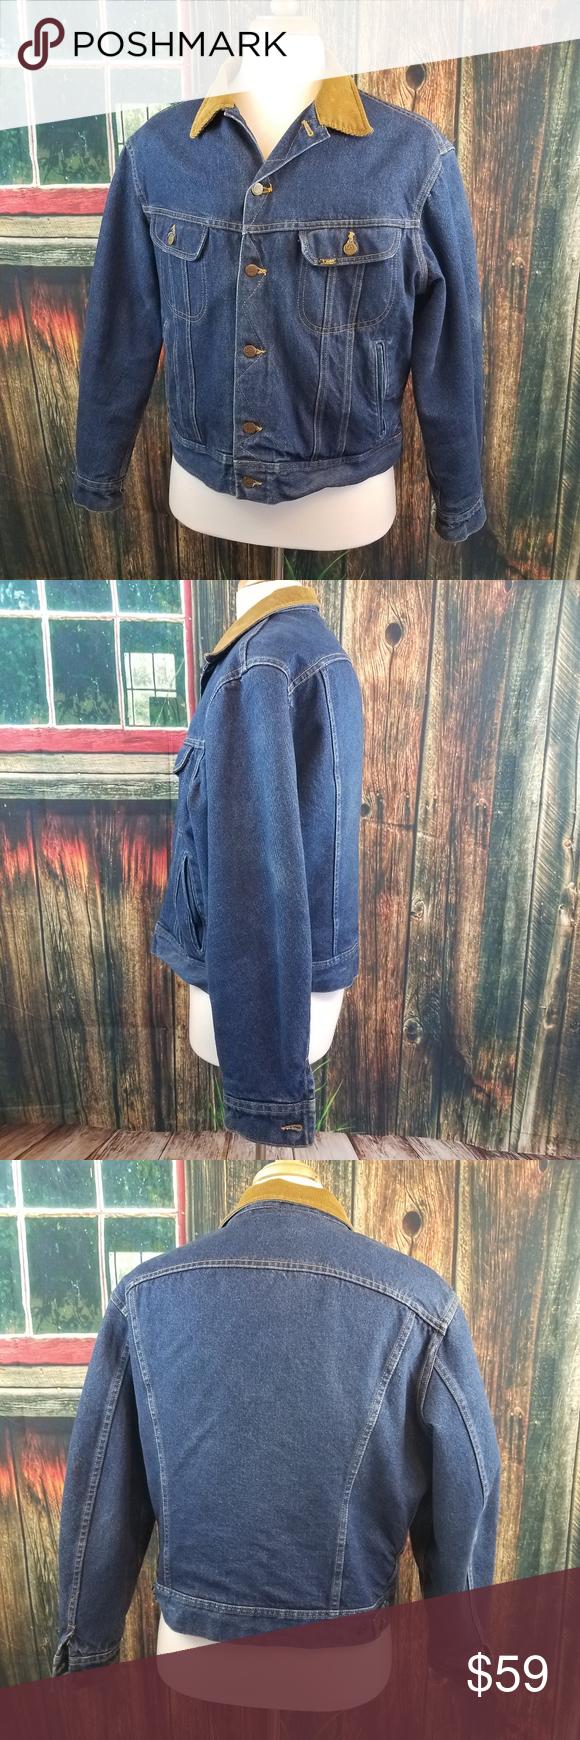 Lee Storm Rider Insulated Denim Jacket Lee Storm Rider Mens Insulated Blue Denim Jean Jacket With 2 Pockets On The Waist Size Lee Jacket Denim Jacket Jackets [ 1740 x 580 Pixel ]